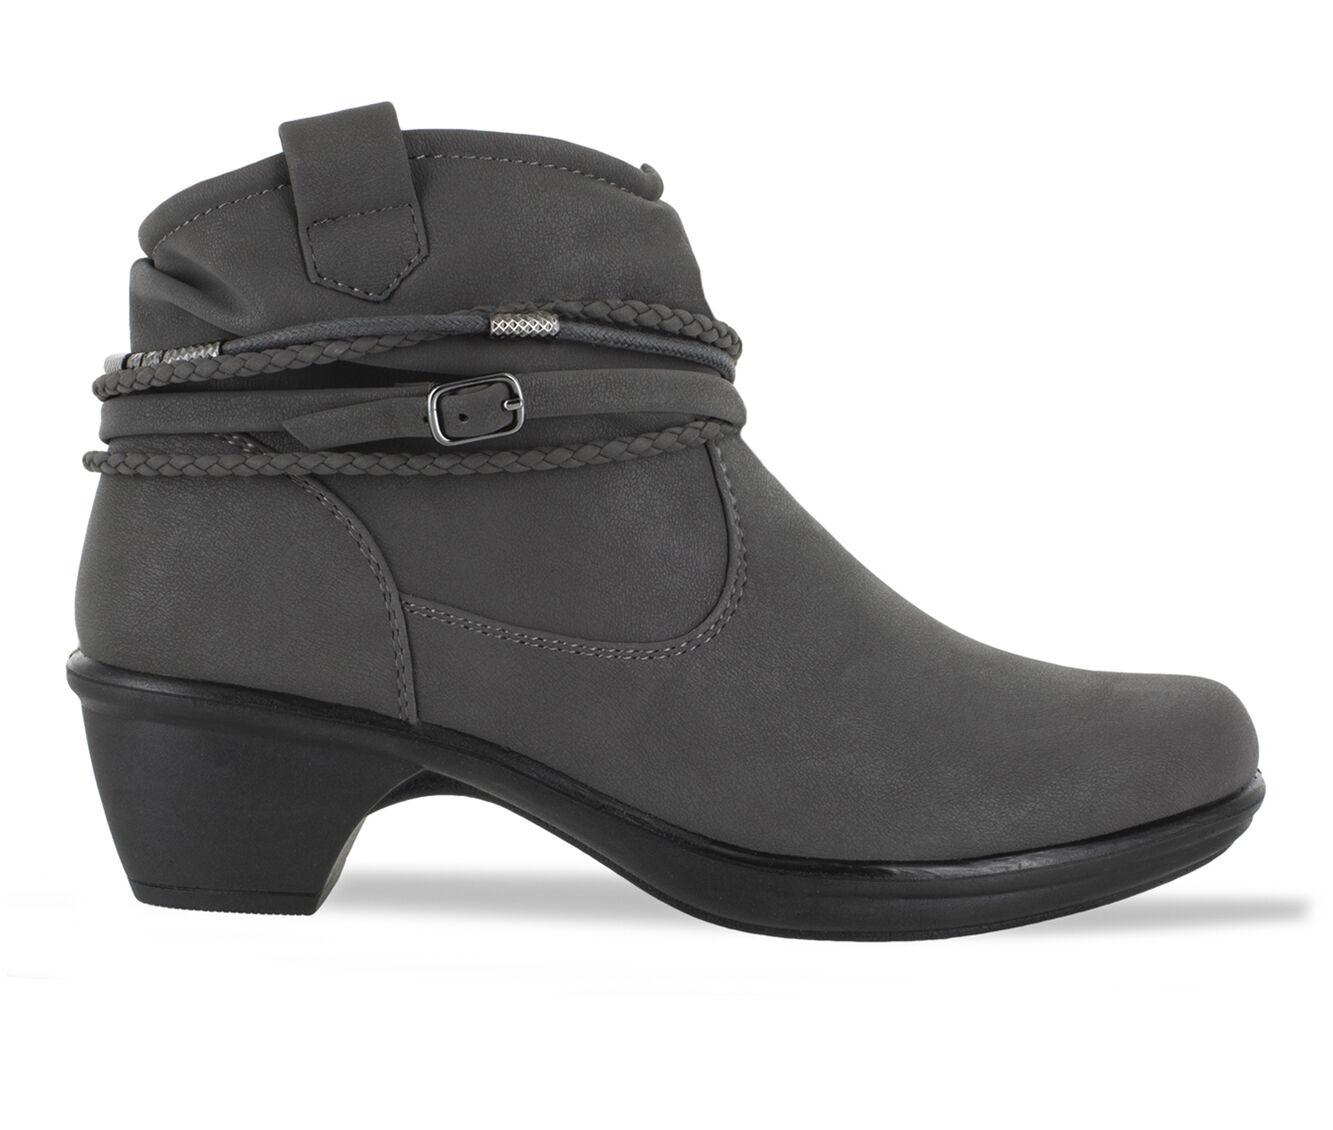 latest style Women's Easy Street Wrangle Booties Grey